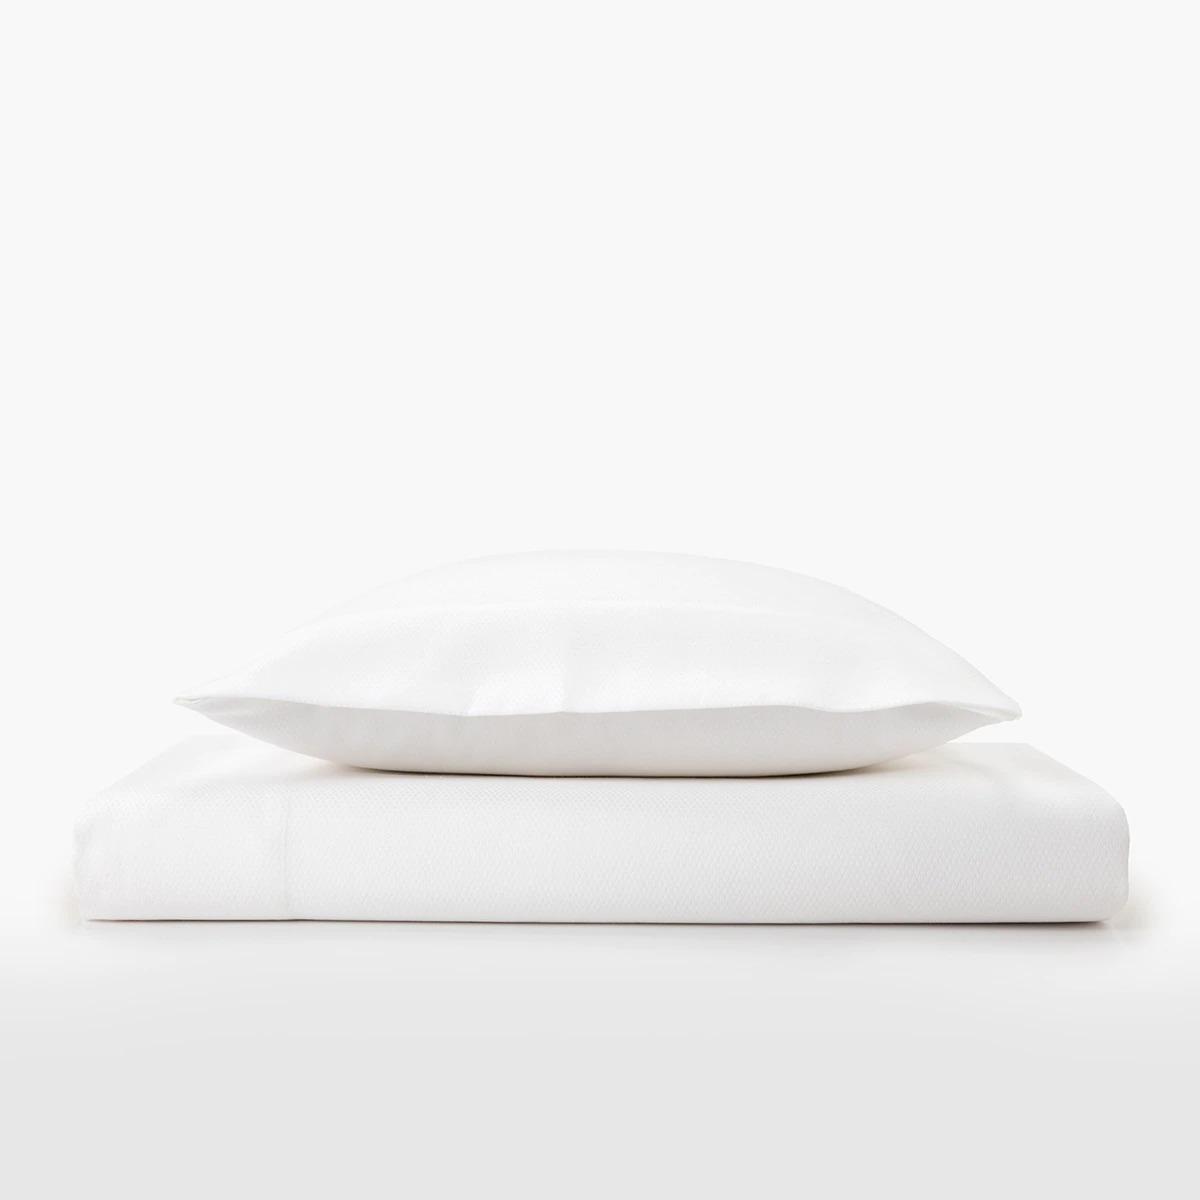 Juego de sábanas de algodón Royal Purificación García para cama de 135 cms